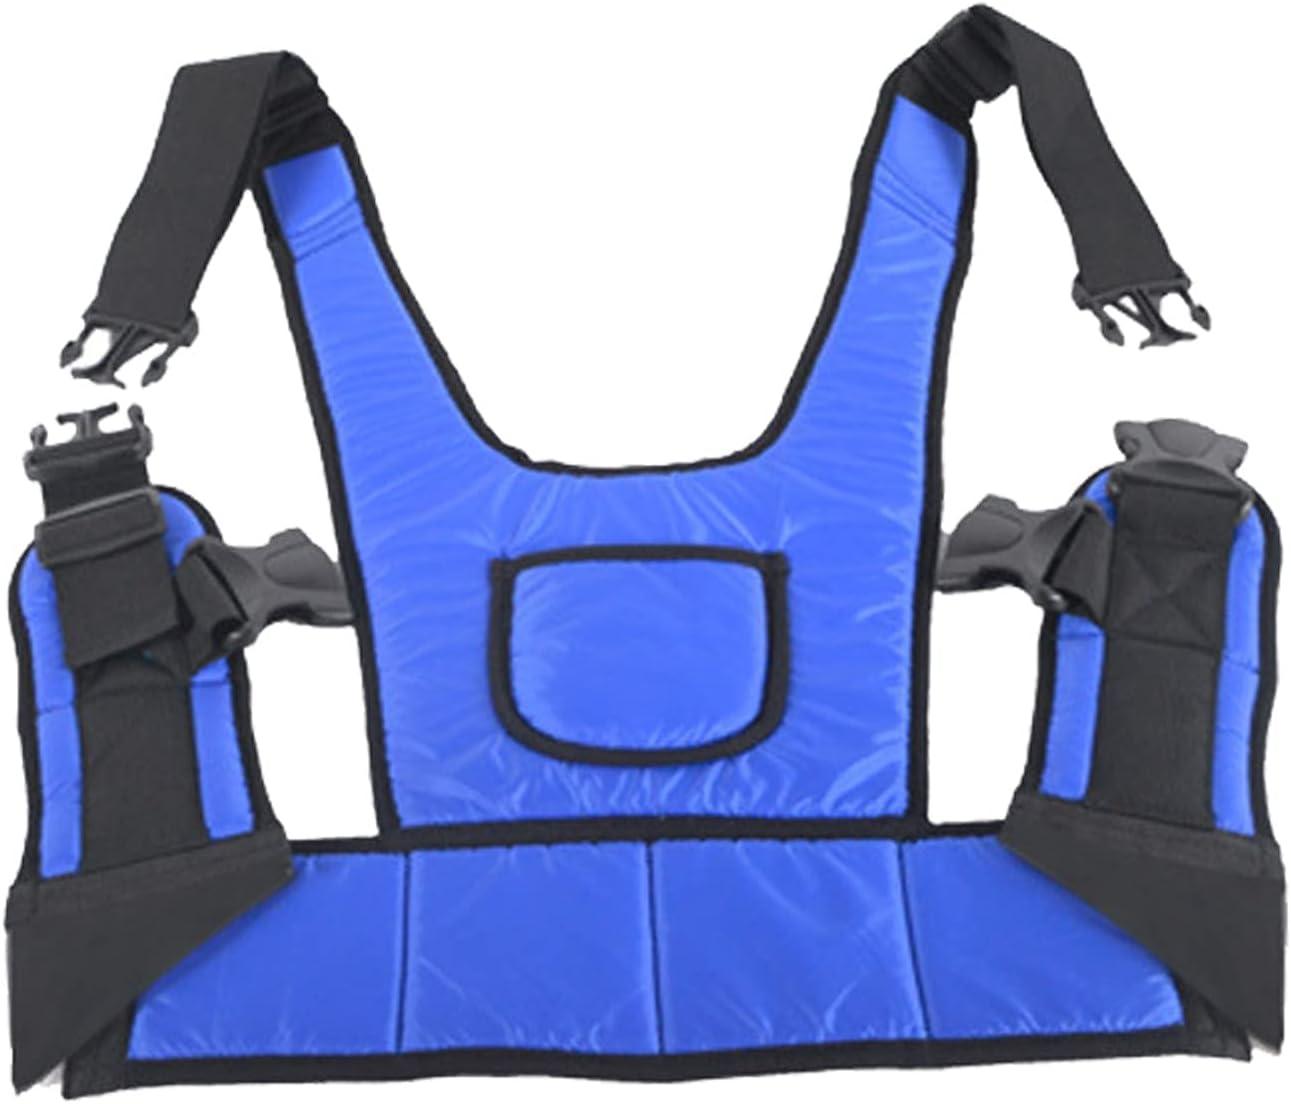 N \ A Wheelchair Las Vegas Mall Vest Harness Restraint Adjustabl Medical Charlotte Mall Chest